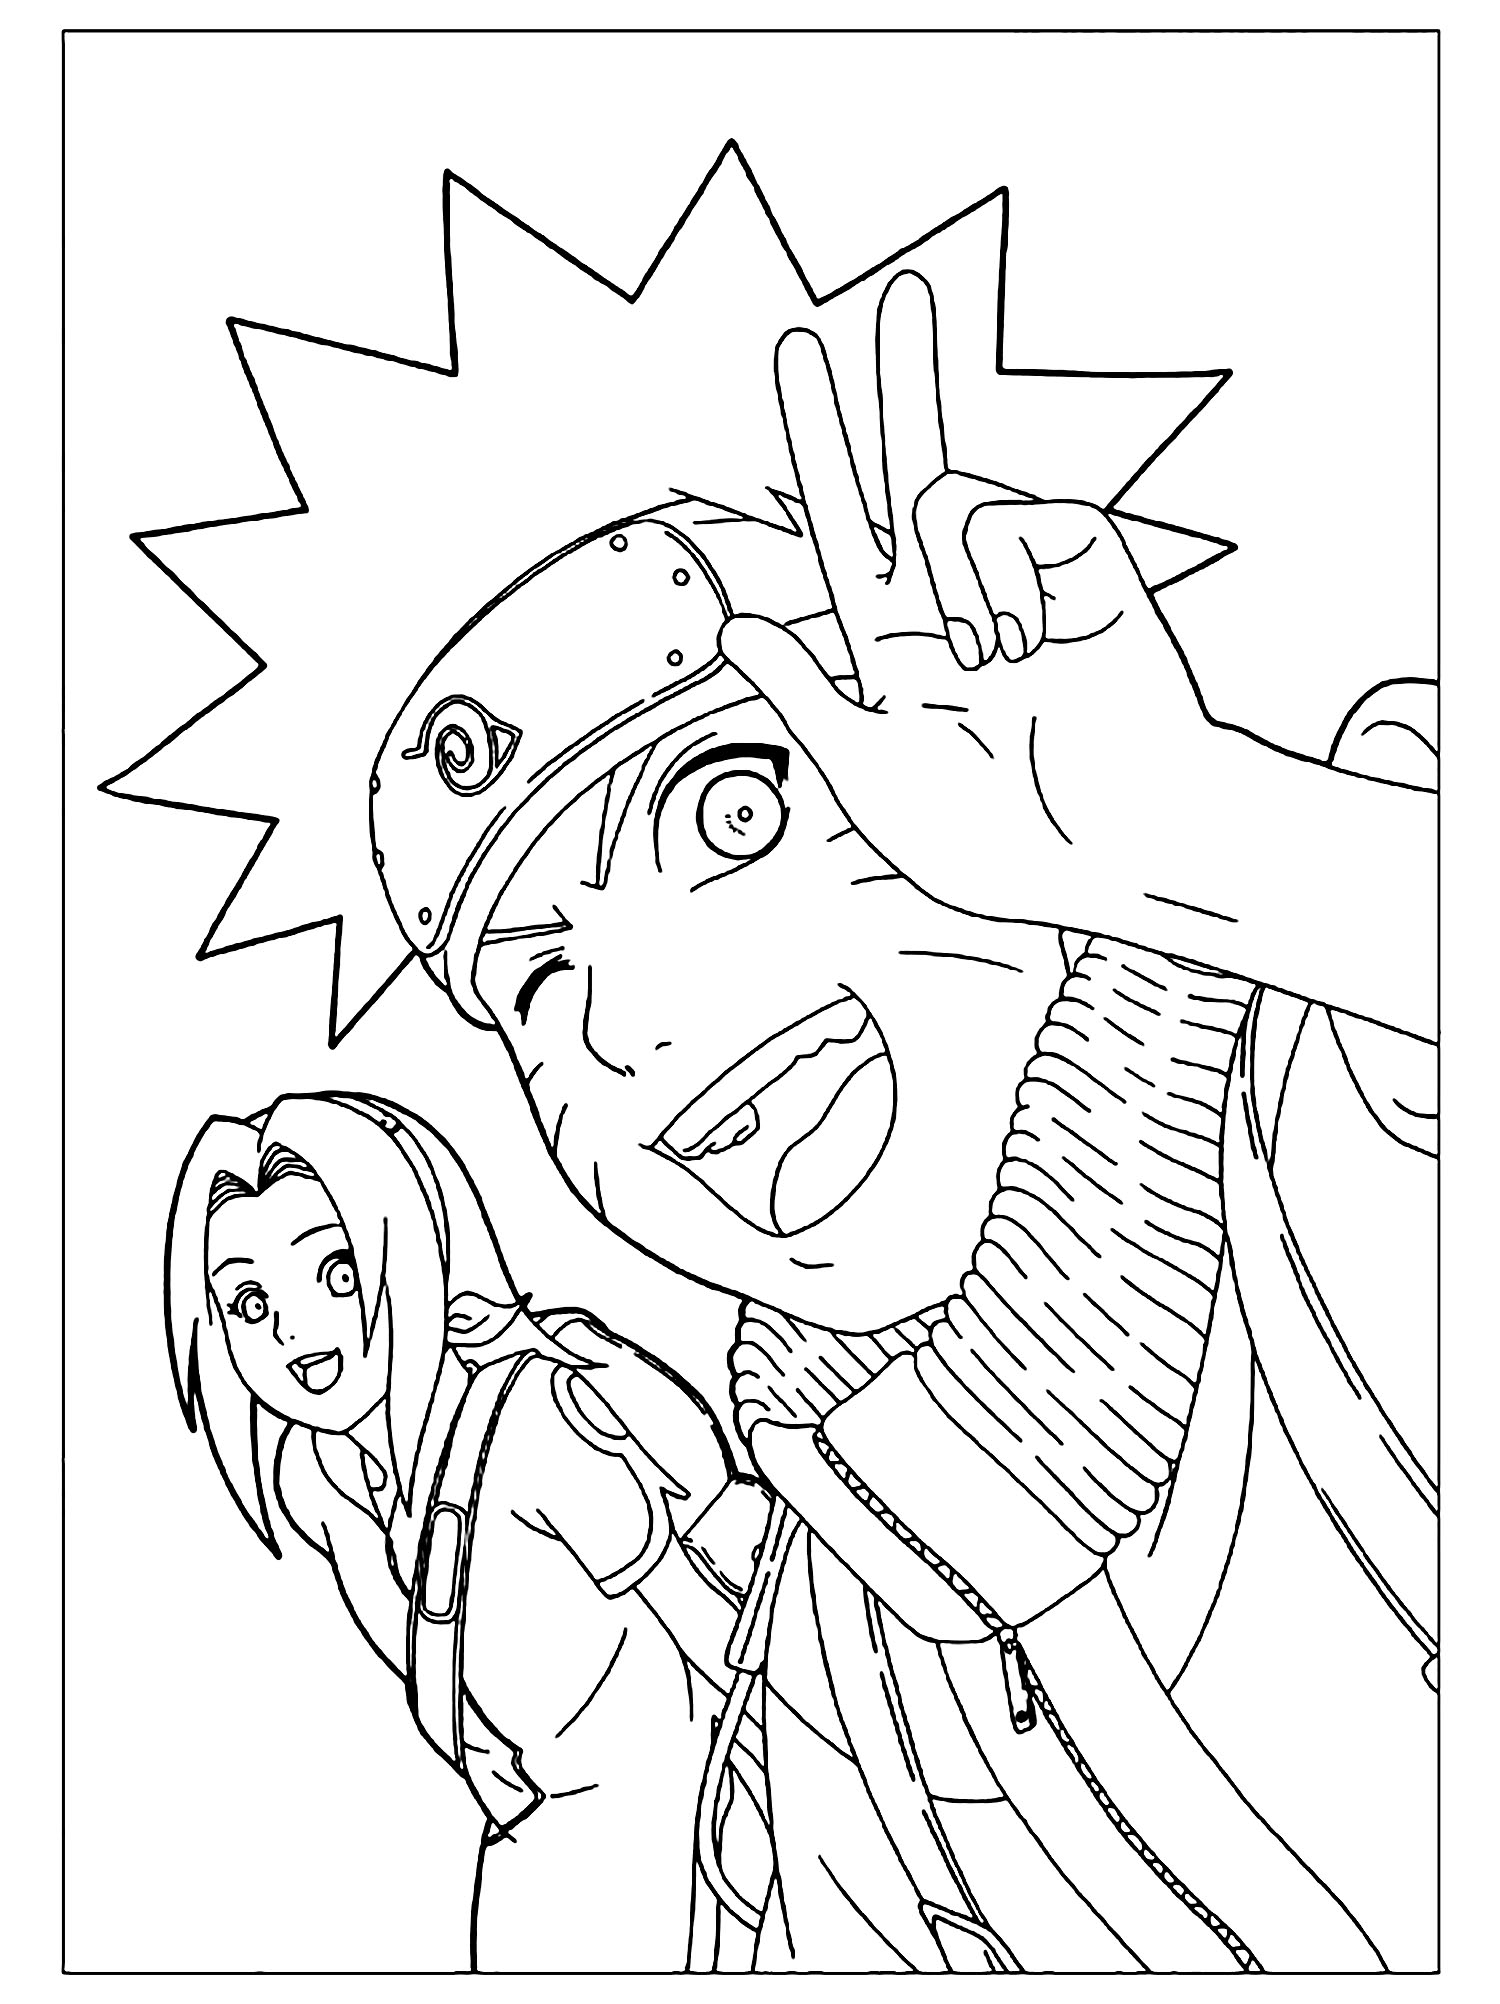 Naruto Et Sakura - Coloriage Naruto - Coloriages Pour Enfants tout Dessin De Naruto